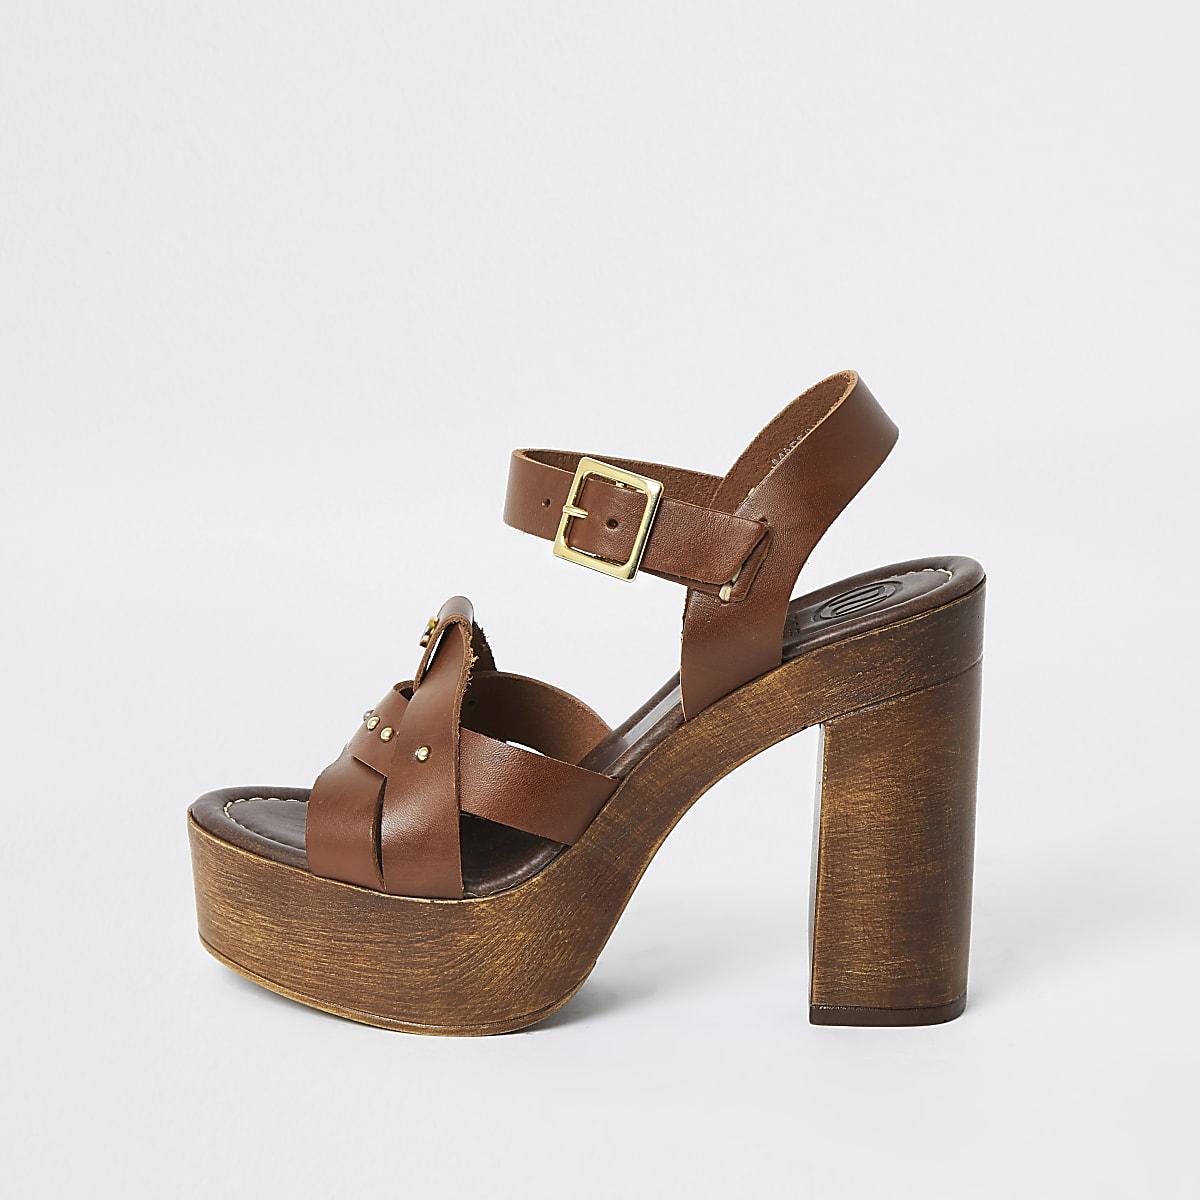 Brown leather platform heels